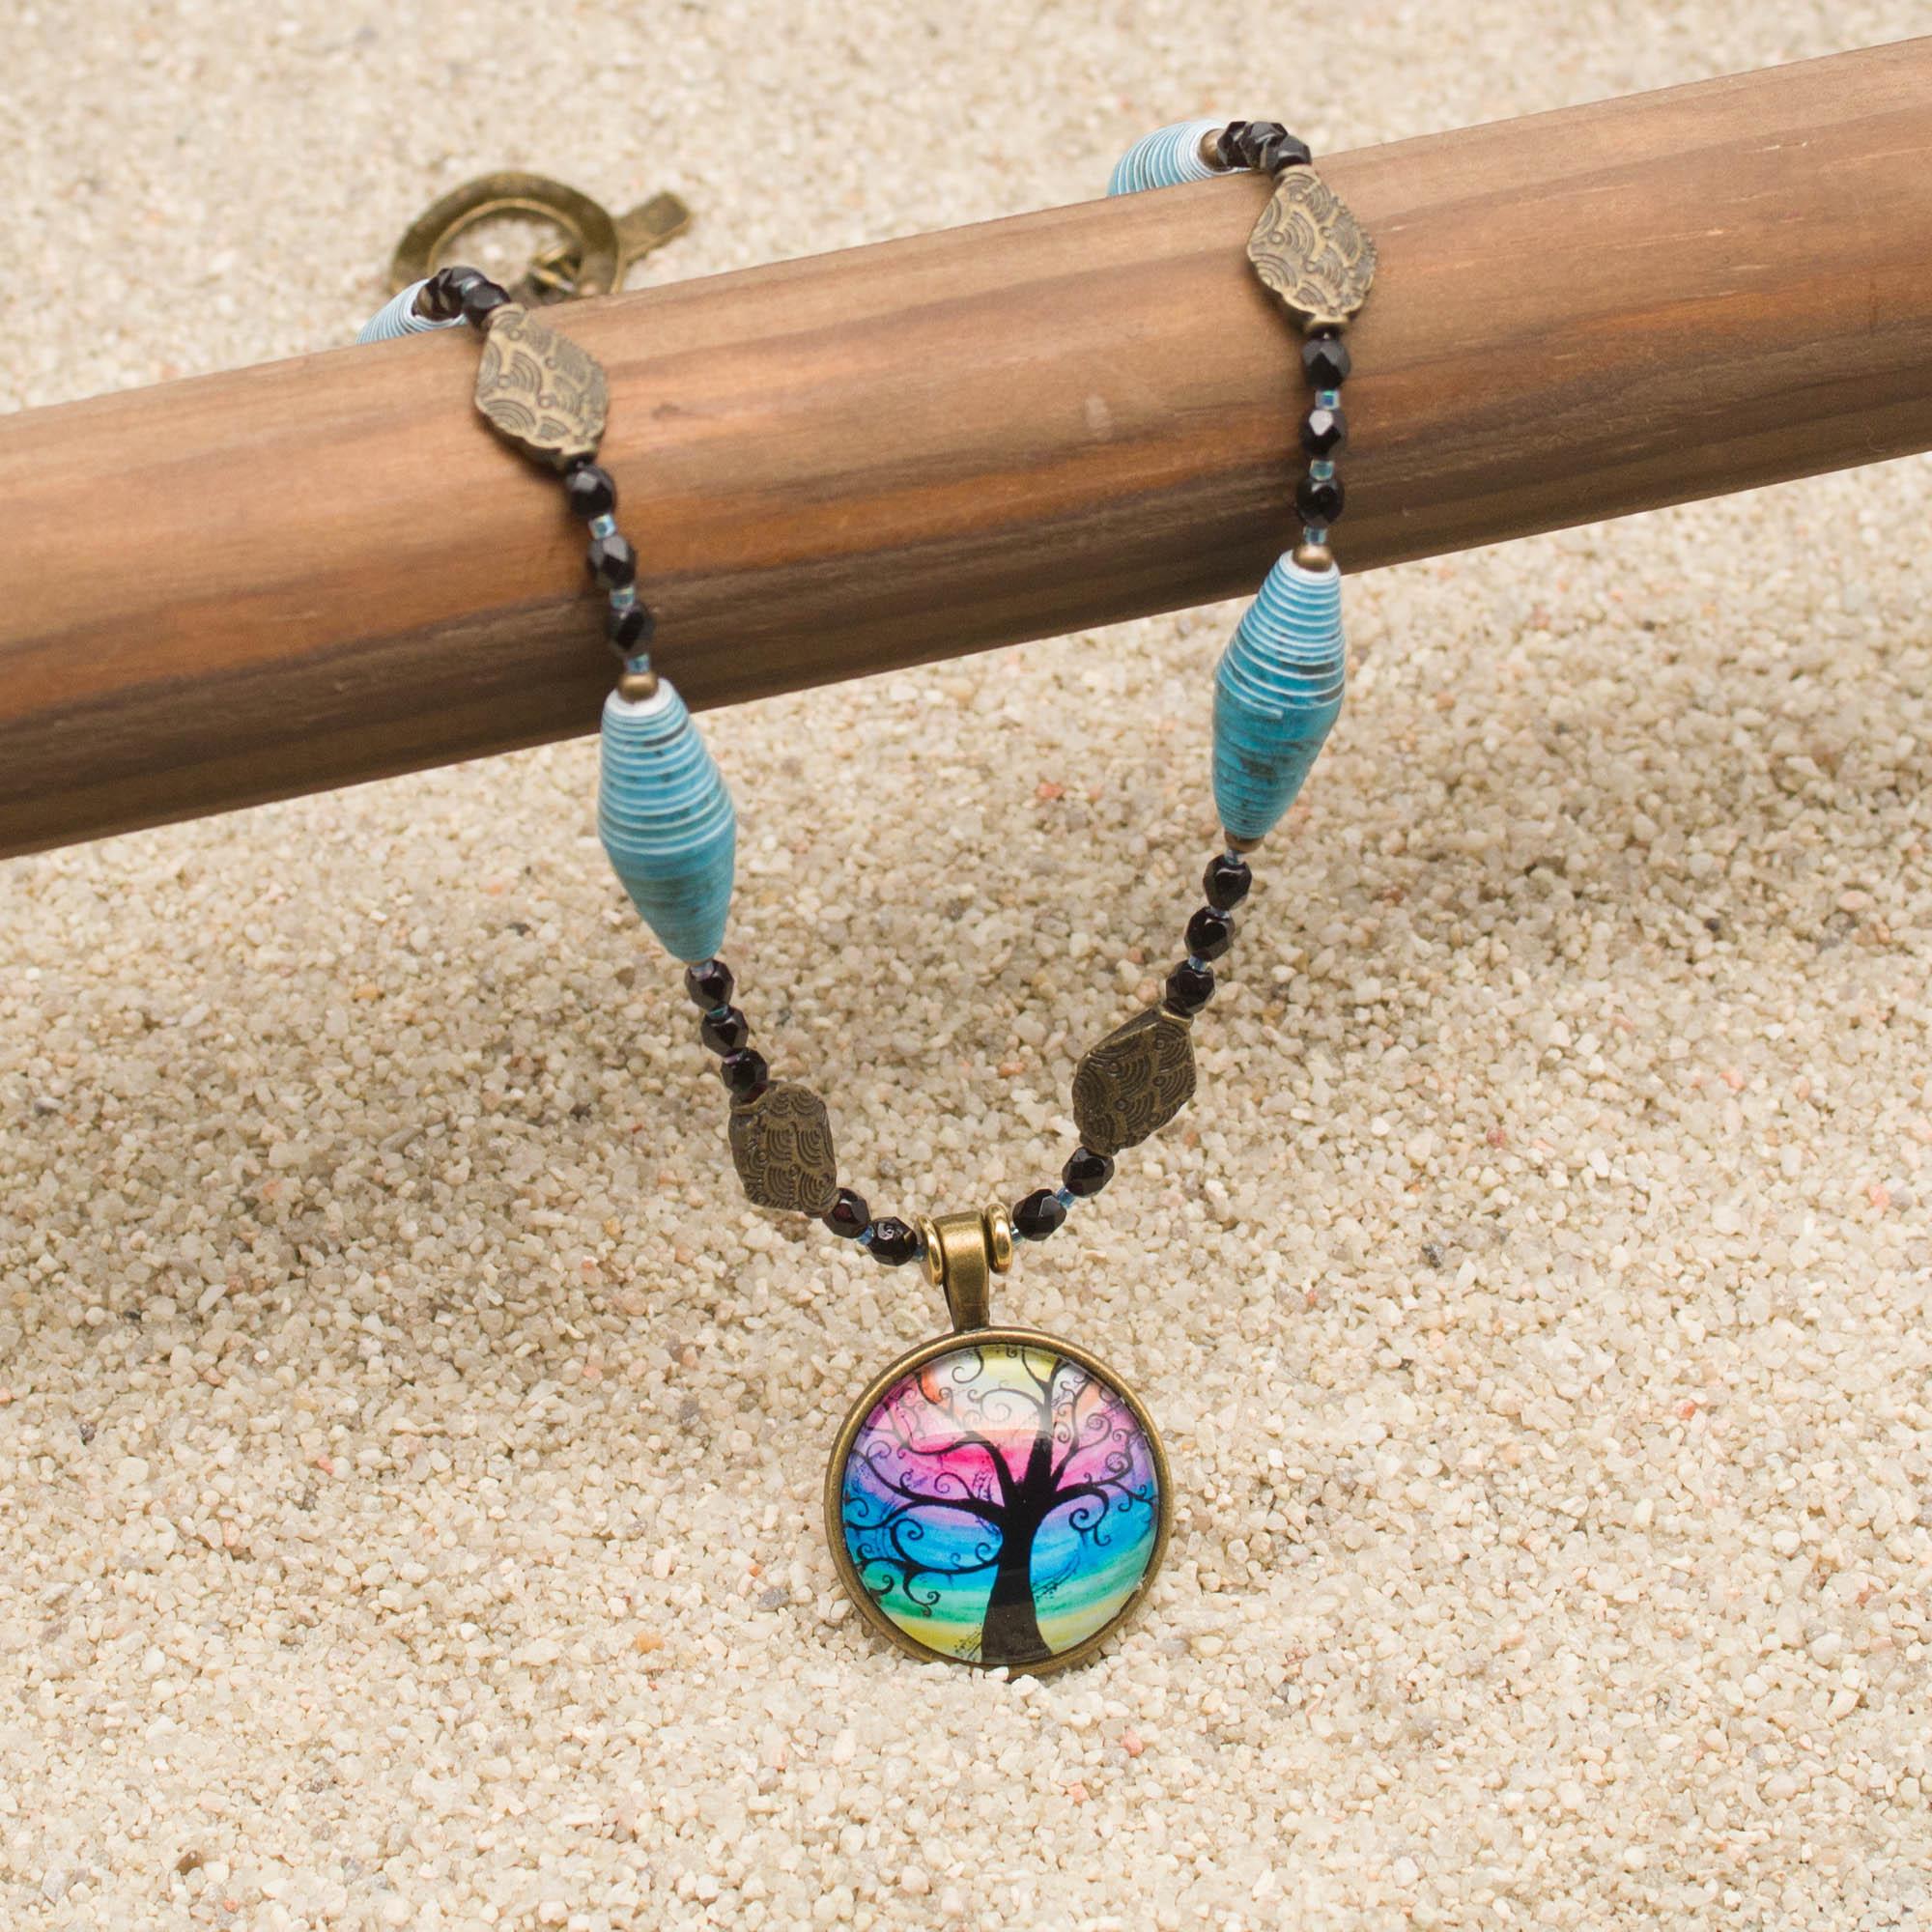 NE812LSa - Mystic Blues Necklace and Earring Set